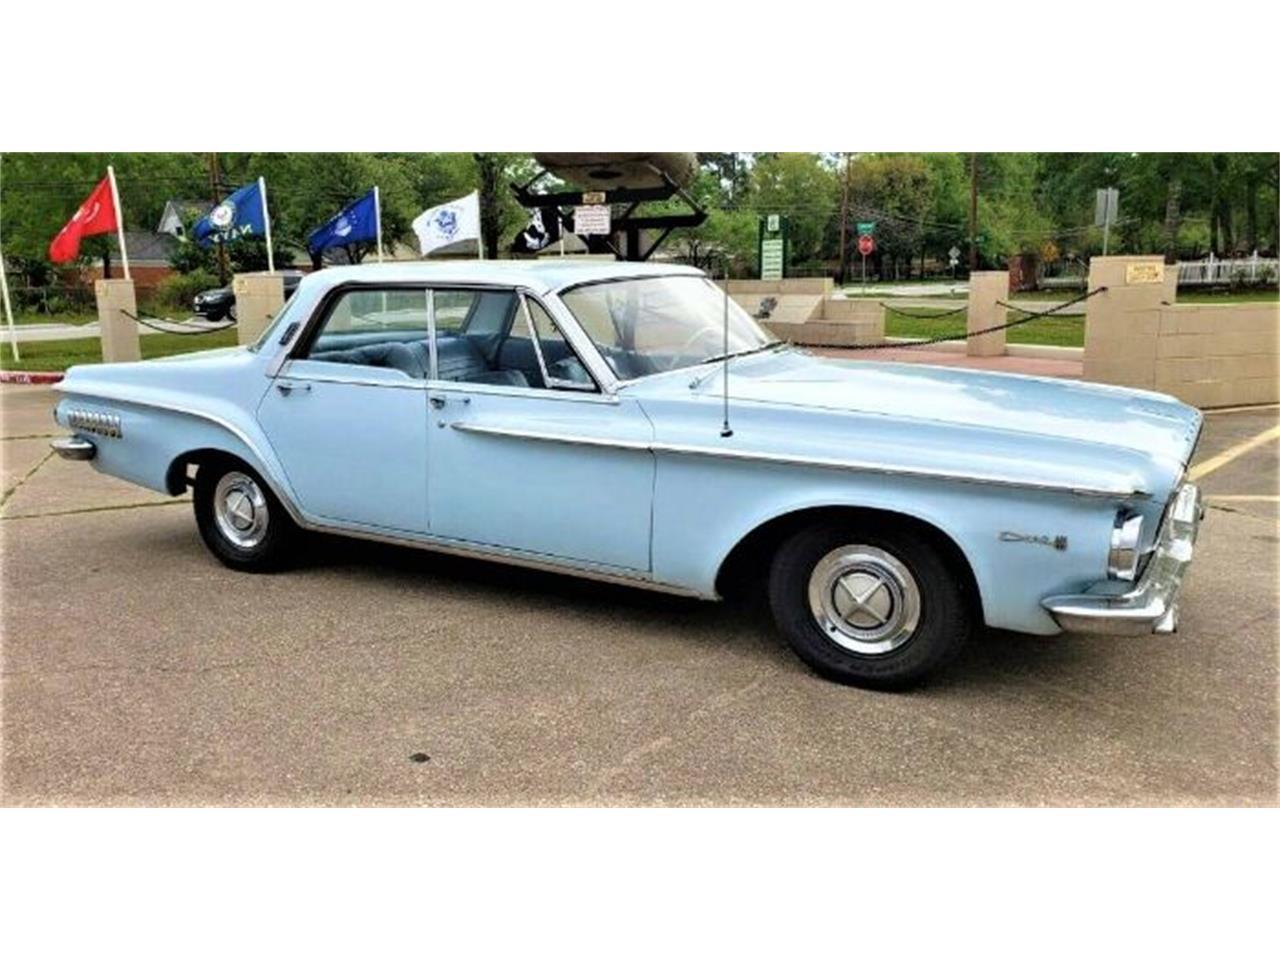 1962 Dodge Dart For Sale Classiccars Com Cc 1424242